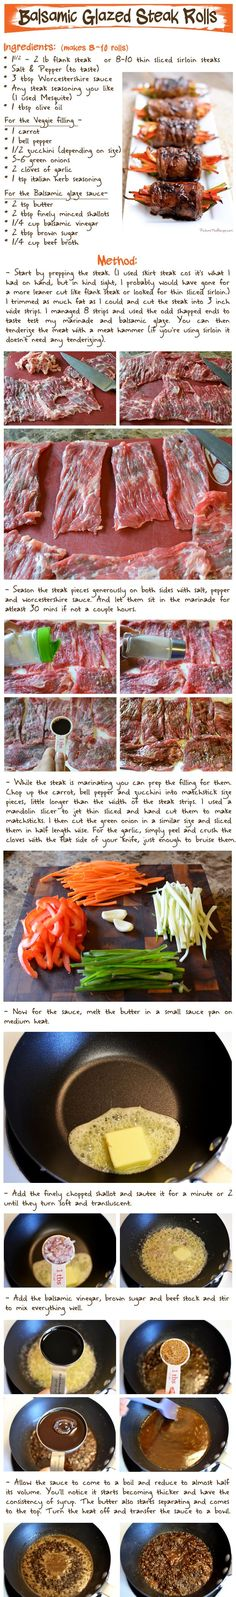 Balsamic Glazed Steak Rolls | Picture the Recipe